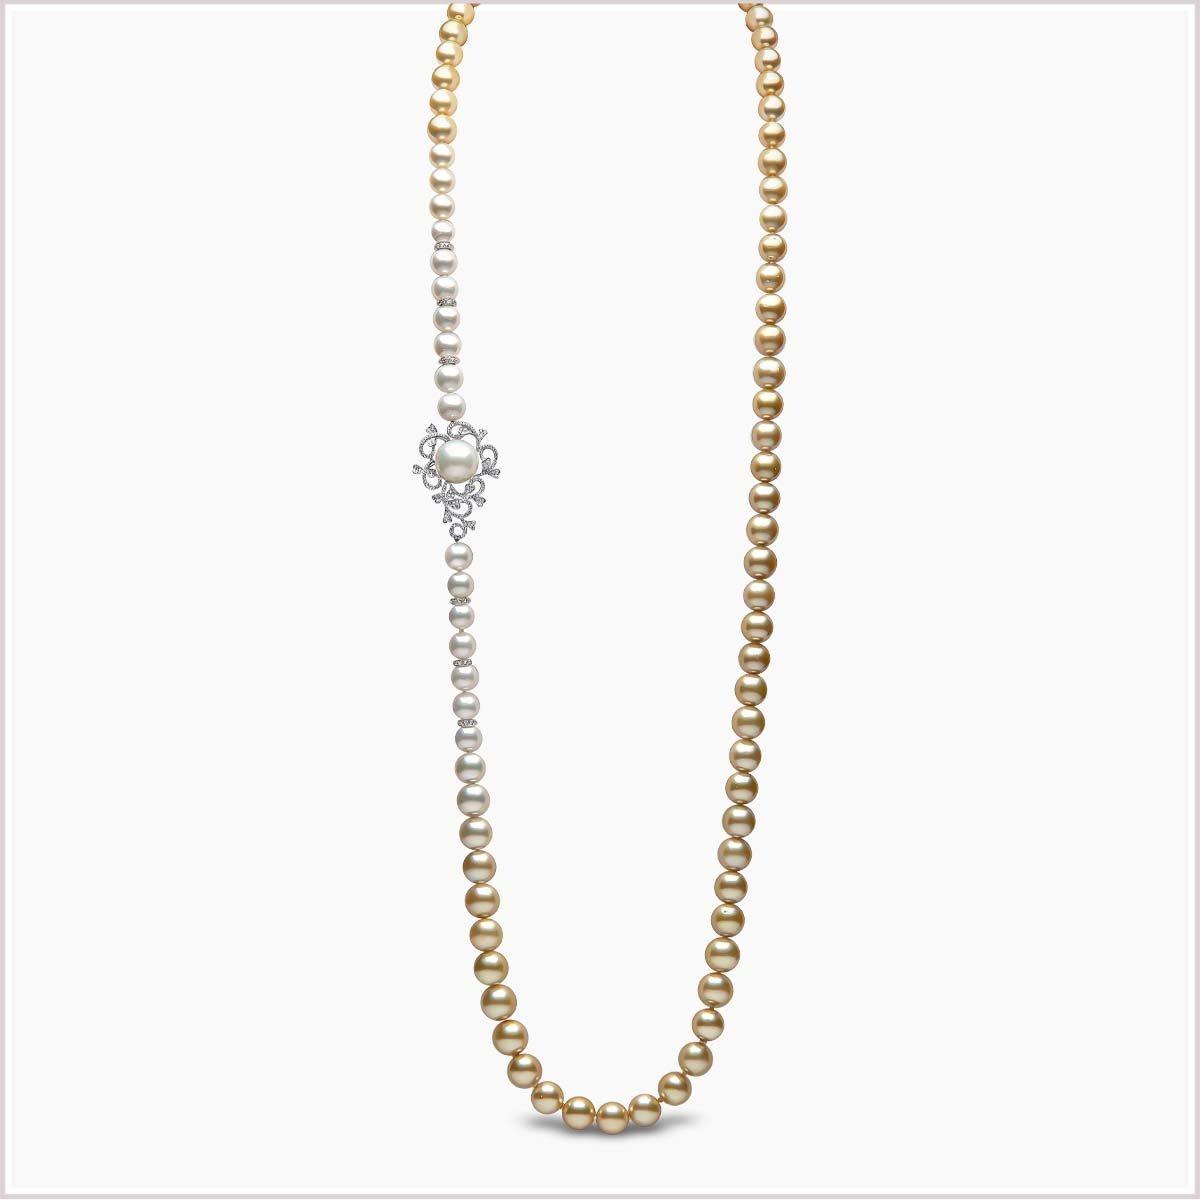 Yoko London Ombré Diamond, Akoya Pearl, South Sea Pearl and Golden South Sea Pearl Necklace